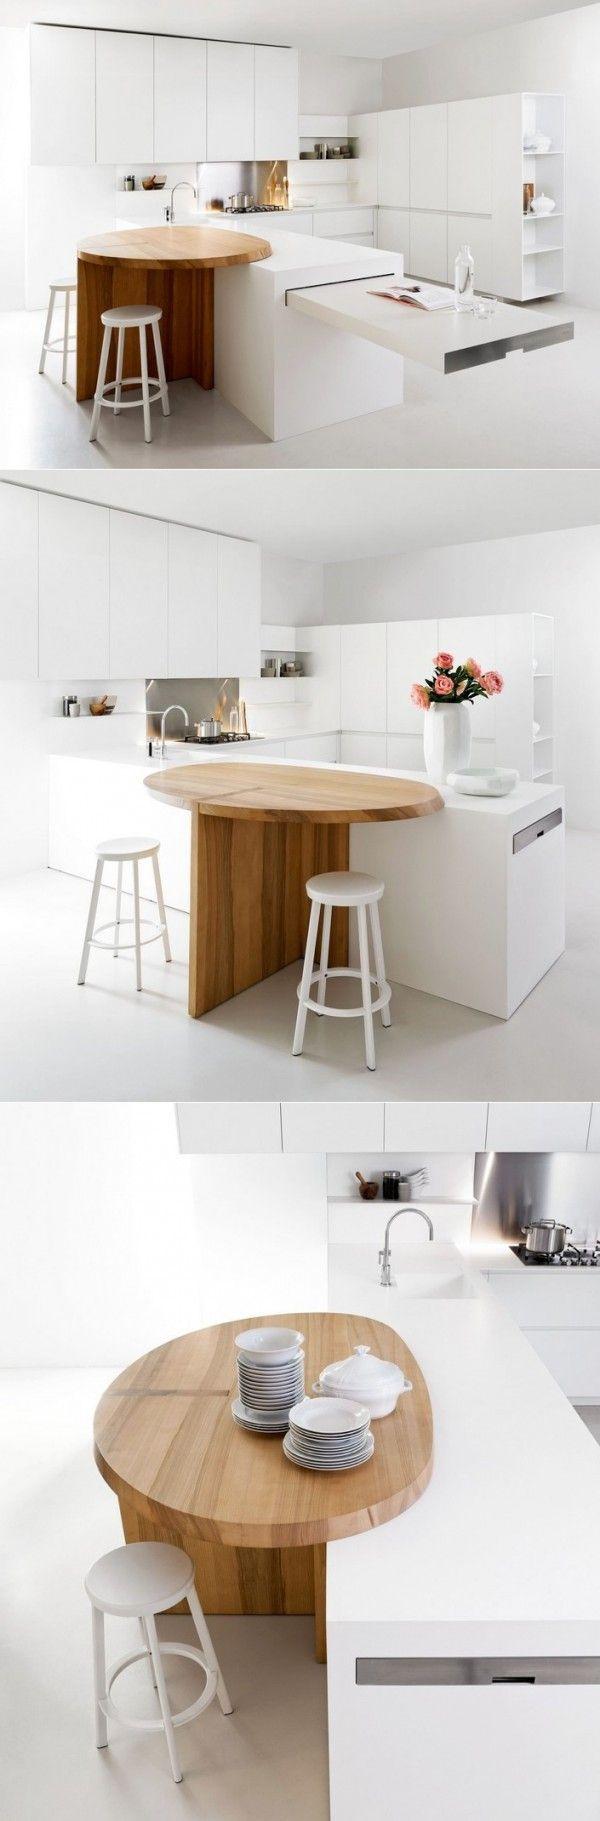 25 Unique Kitchen Countertops. #Kitchen Design